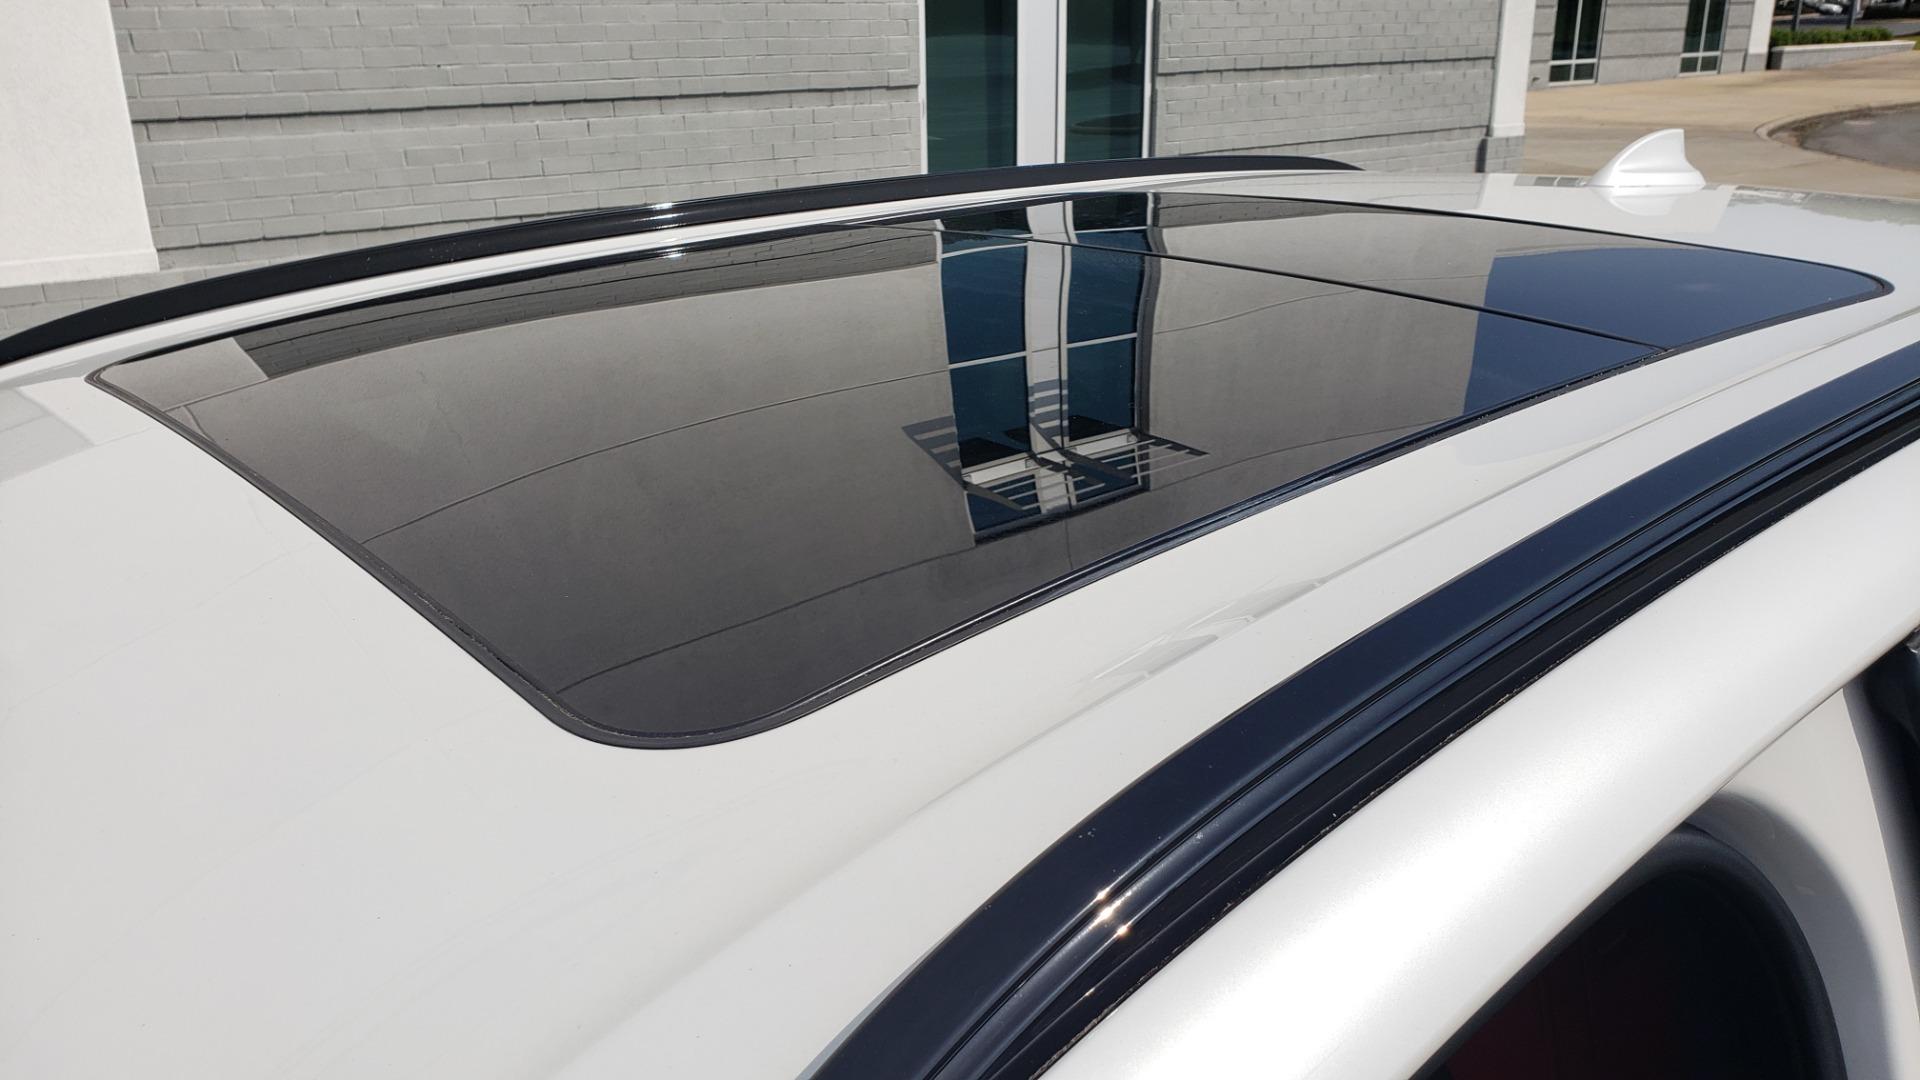 Used 2017 BMW X5 M EXECUTIVE PKG / NAV / DRVR ASST / BSM / HUD / HTD STS / WIFI for sale Sold at Formula Imports in Charlotte NC 28227 10